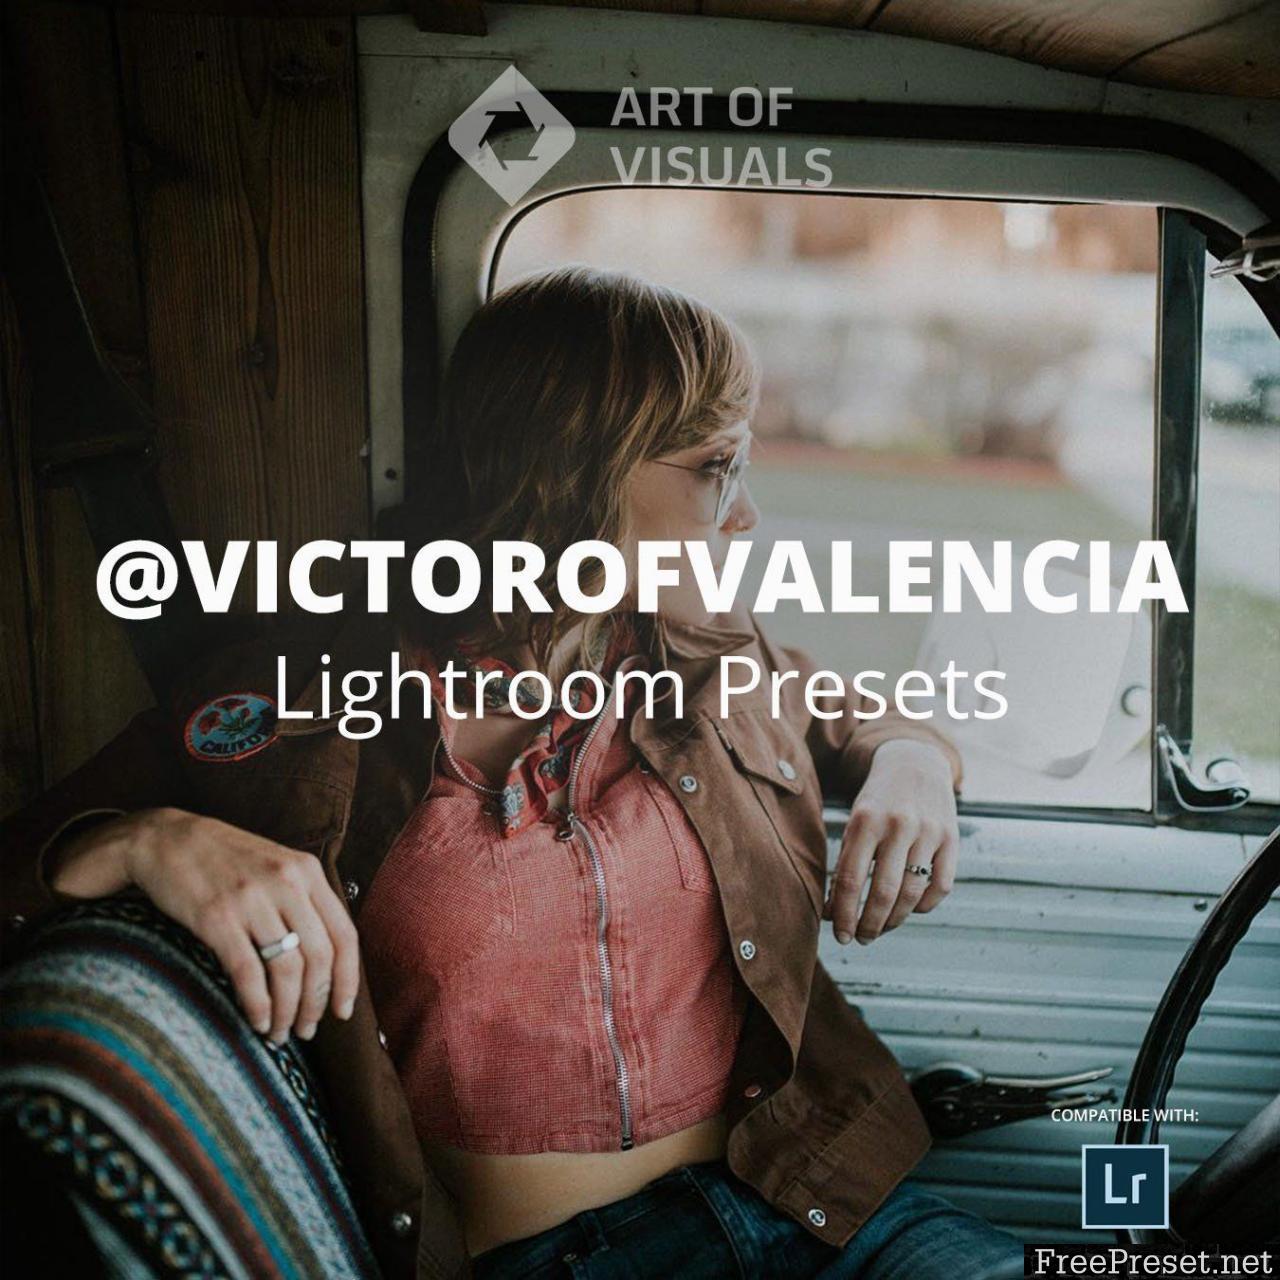 AOV X Victor of Valencia Lightroom Presets/Adobe Camera Raw